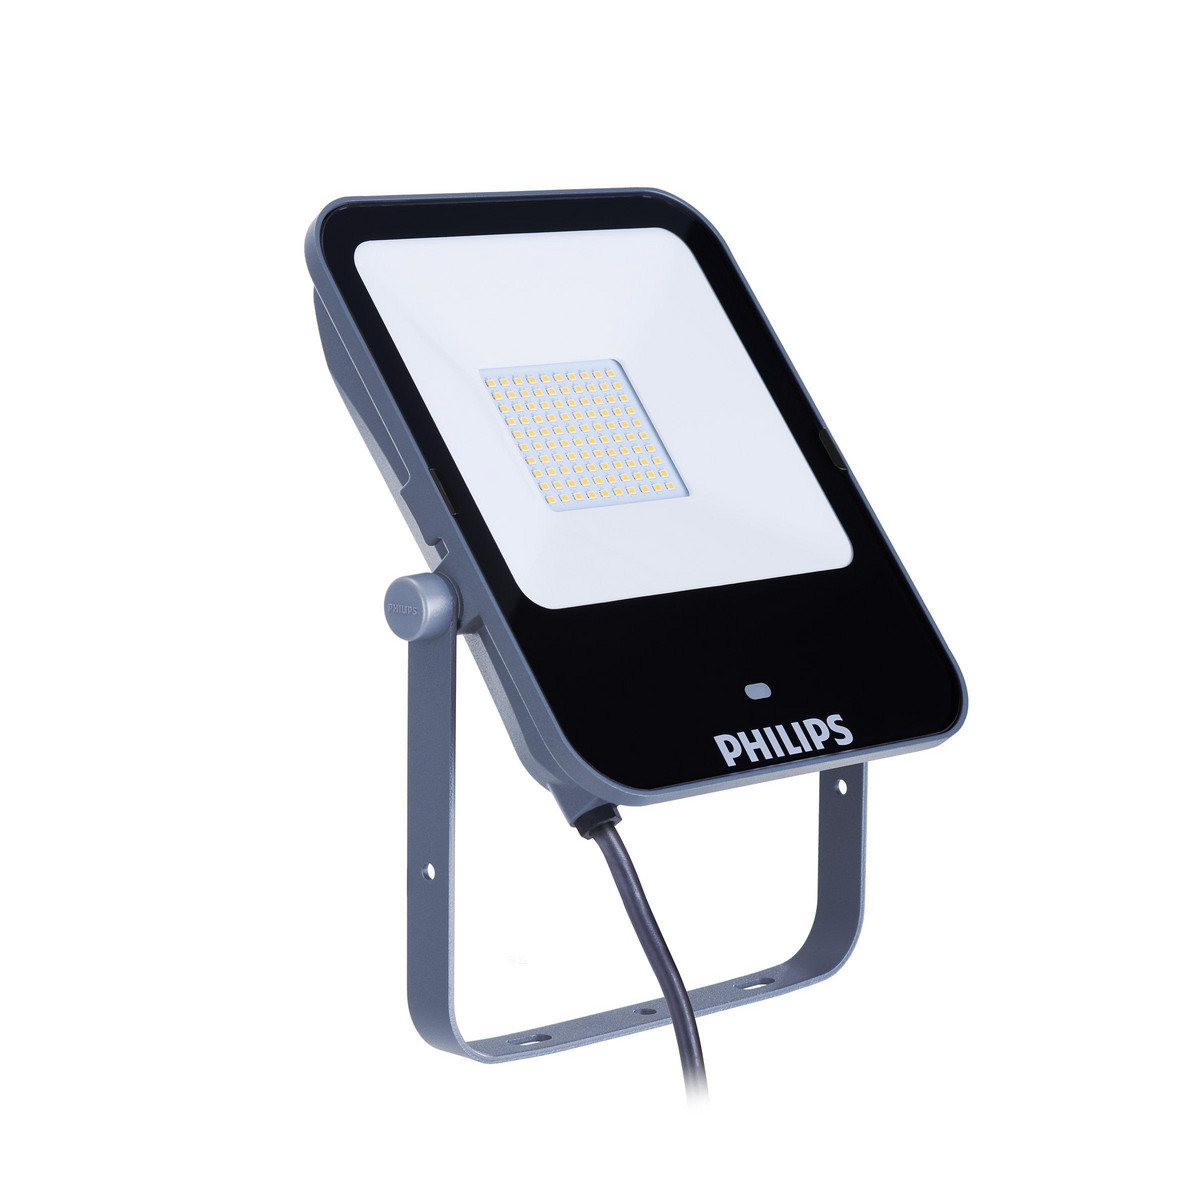 Ledinaire Projektør Gen2 Lille BVP154 LED 5000lm/830 50W Meget bredstrålende (VWB) Mikrobølgesensor